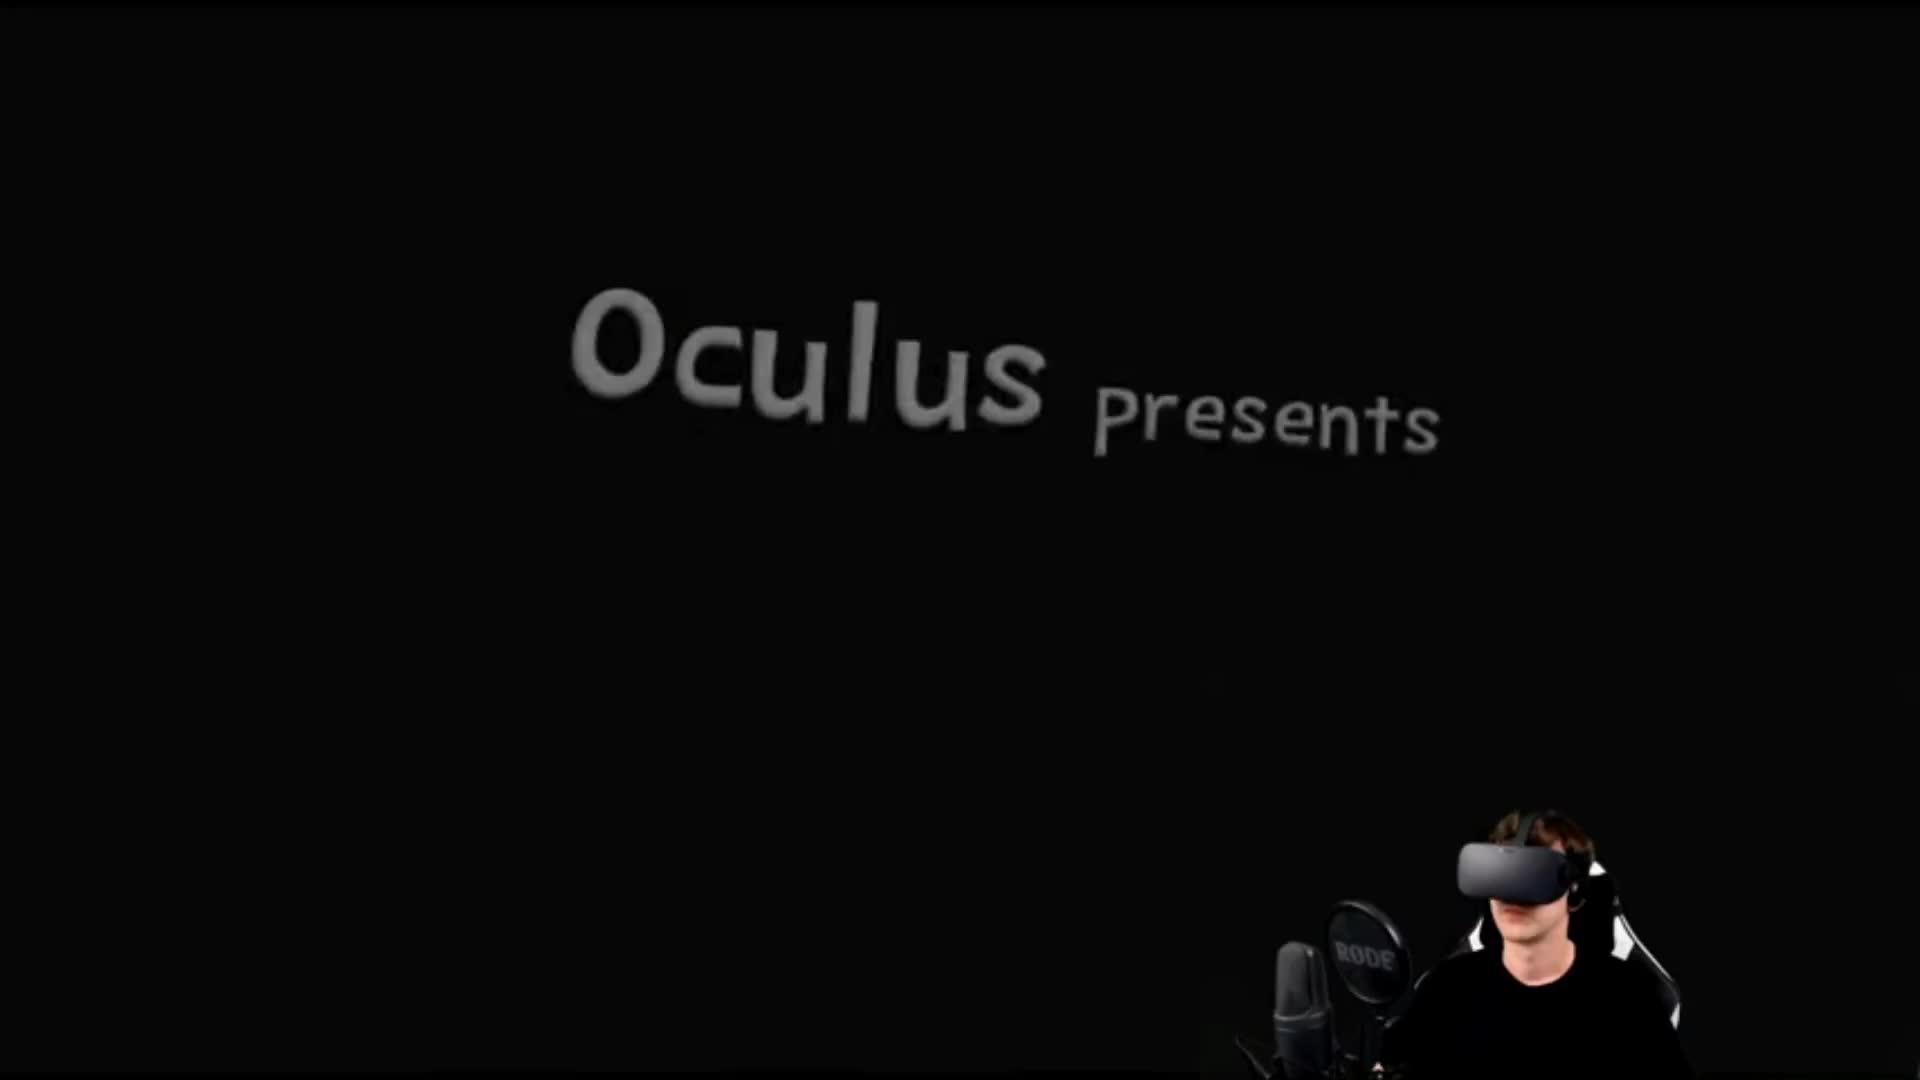 oculus story studio GIFs